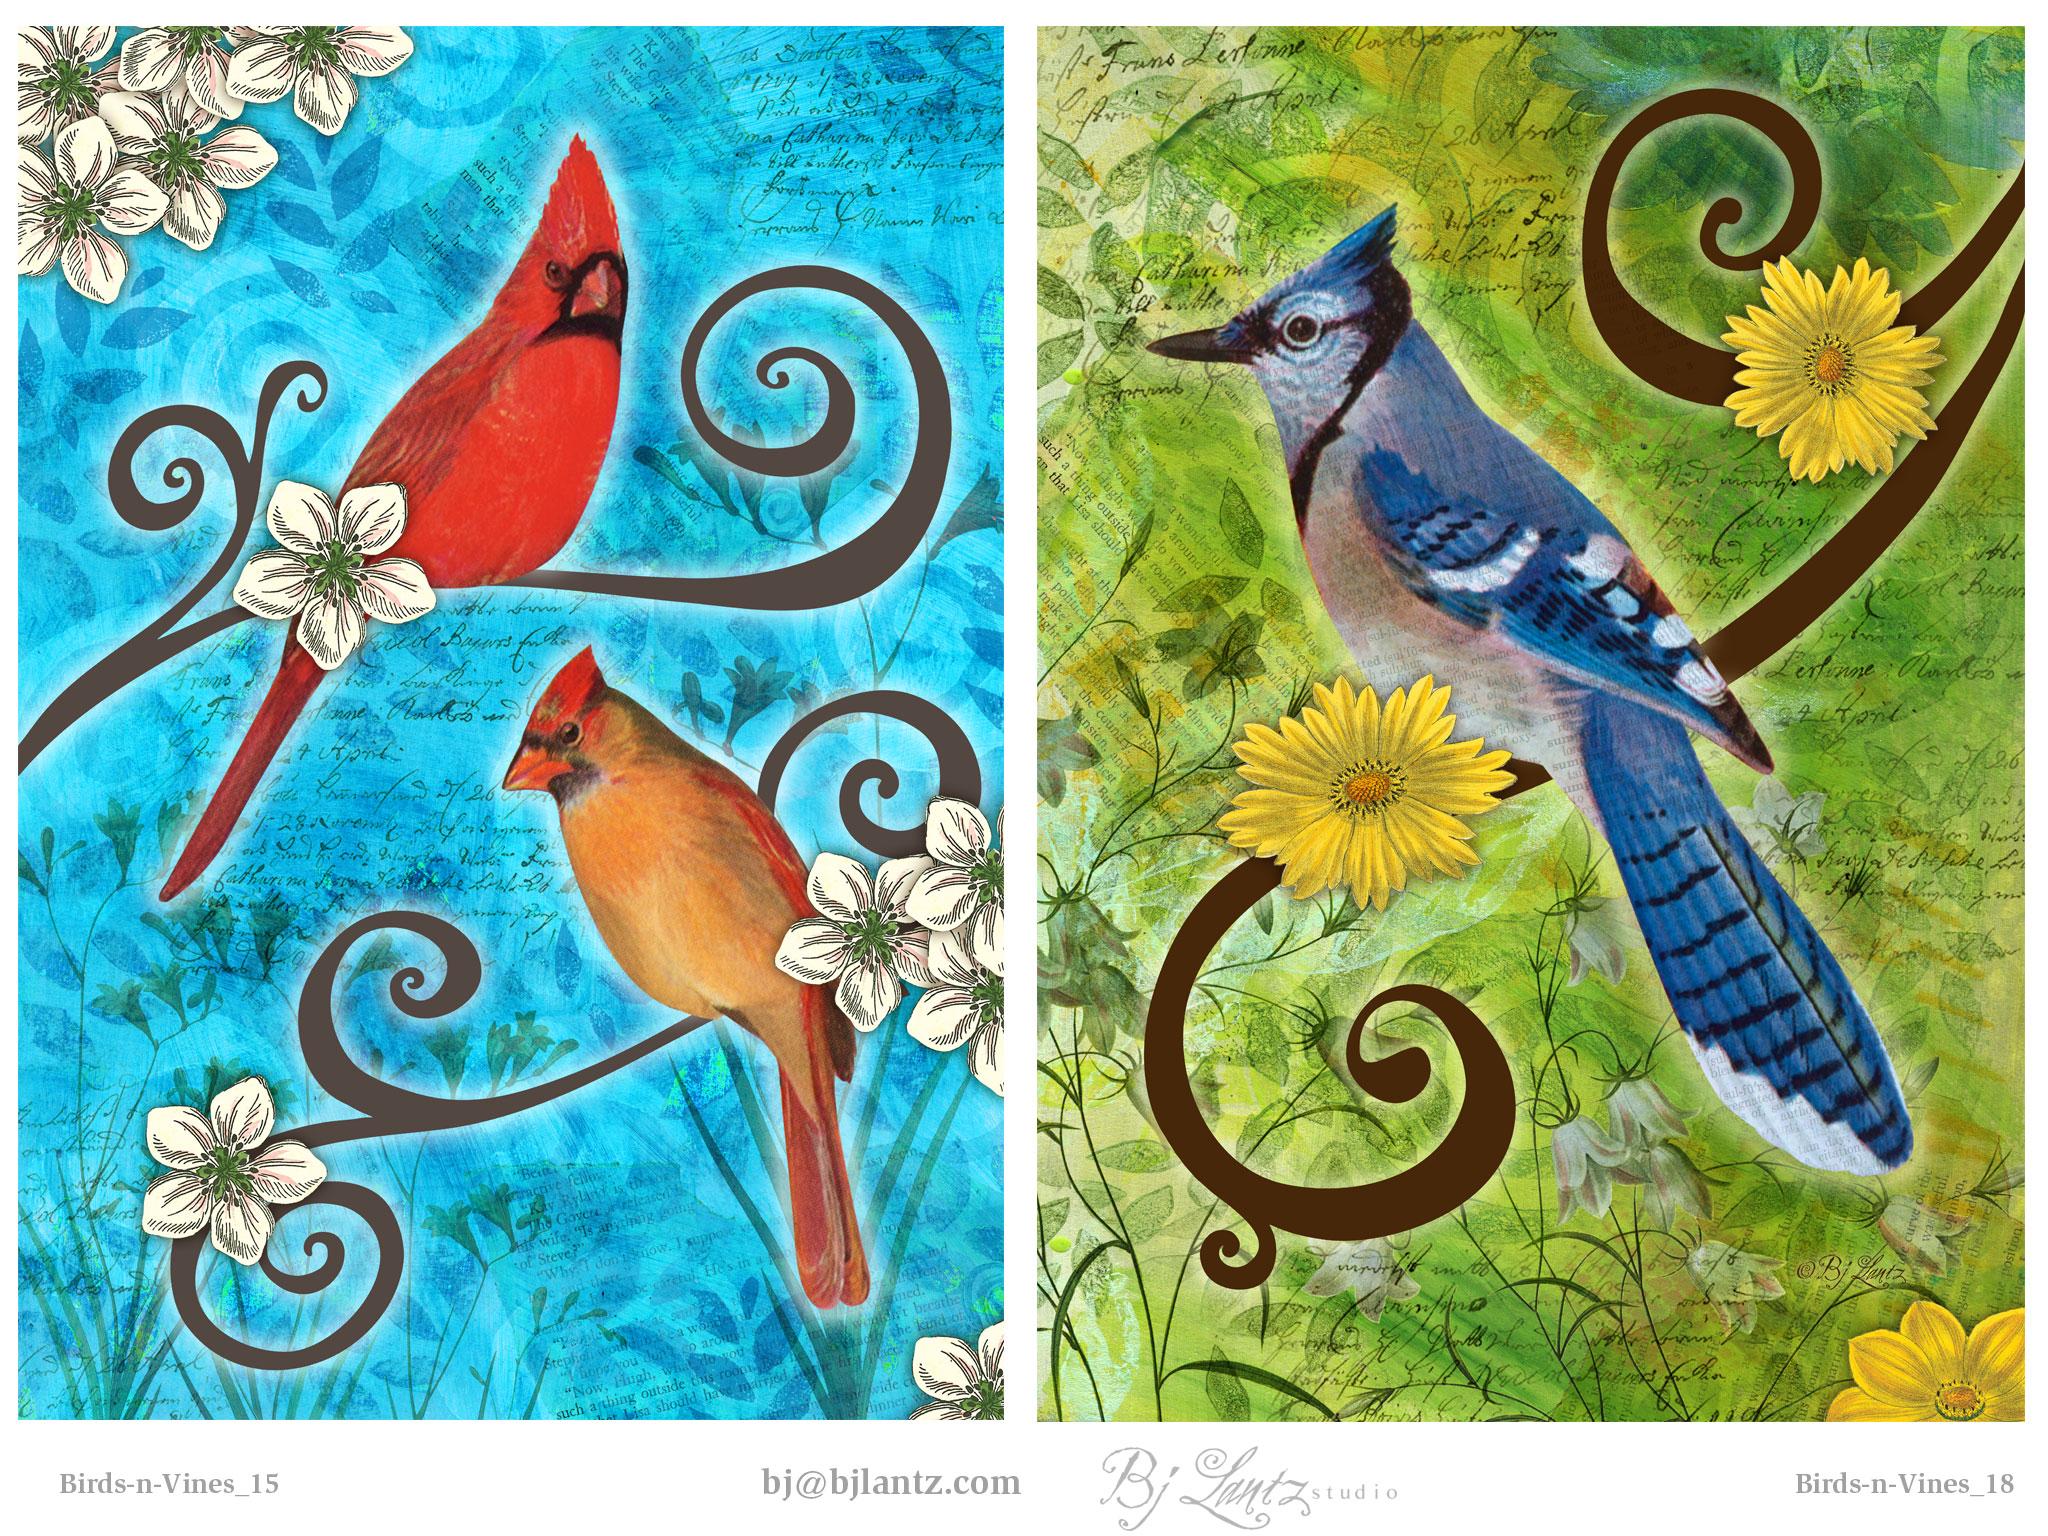 Birds-n-Vines_BJLantz_1.jpg